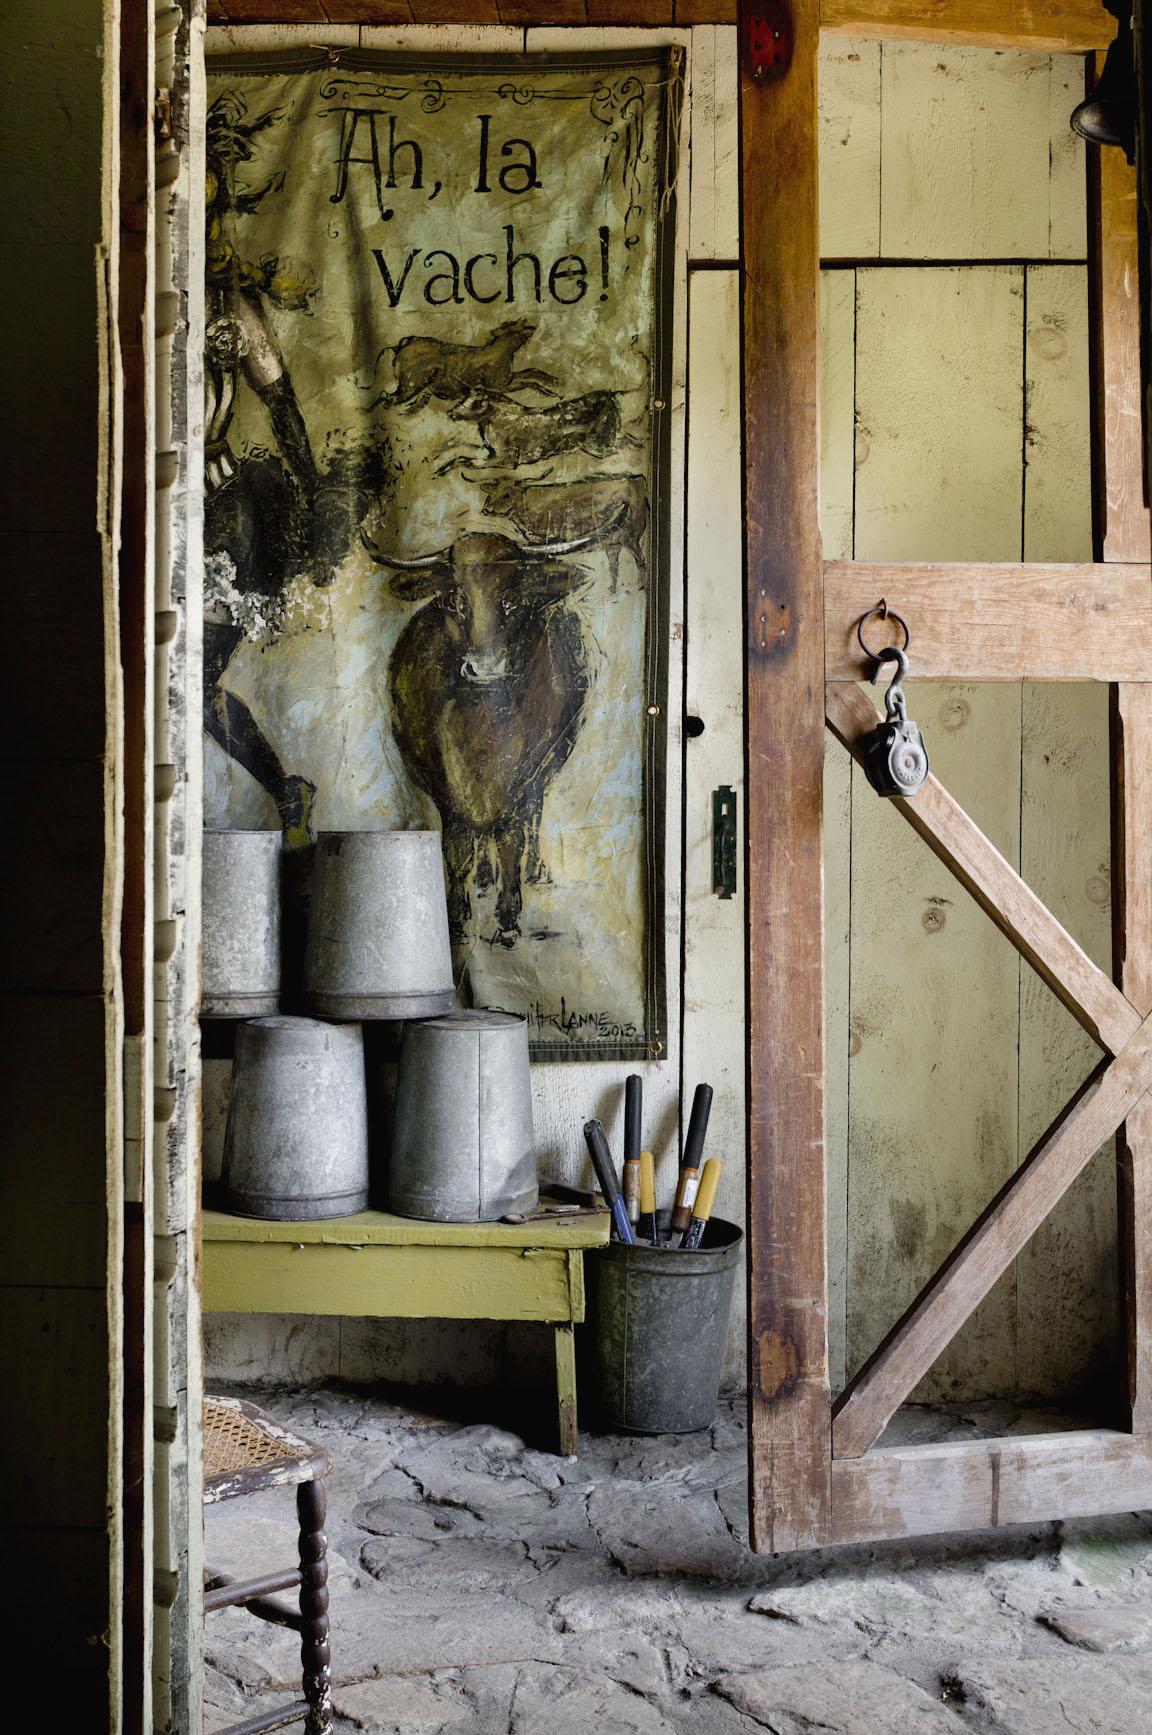 rustic-farm-barn-entrance-artist-interior-photography.jpg